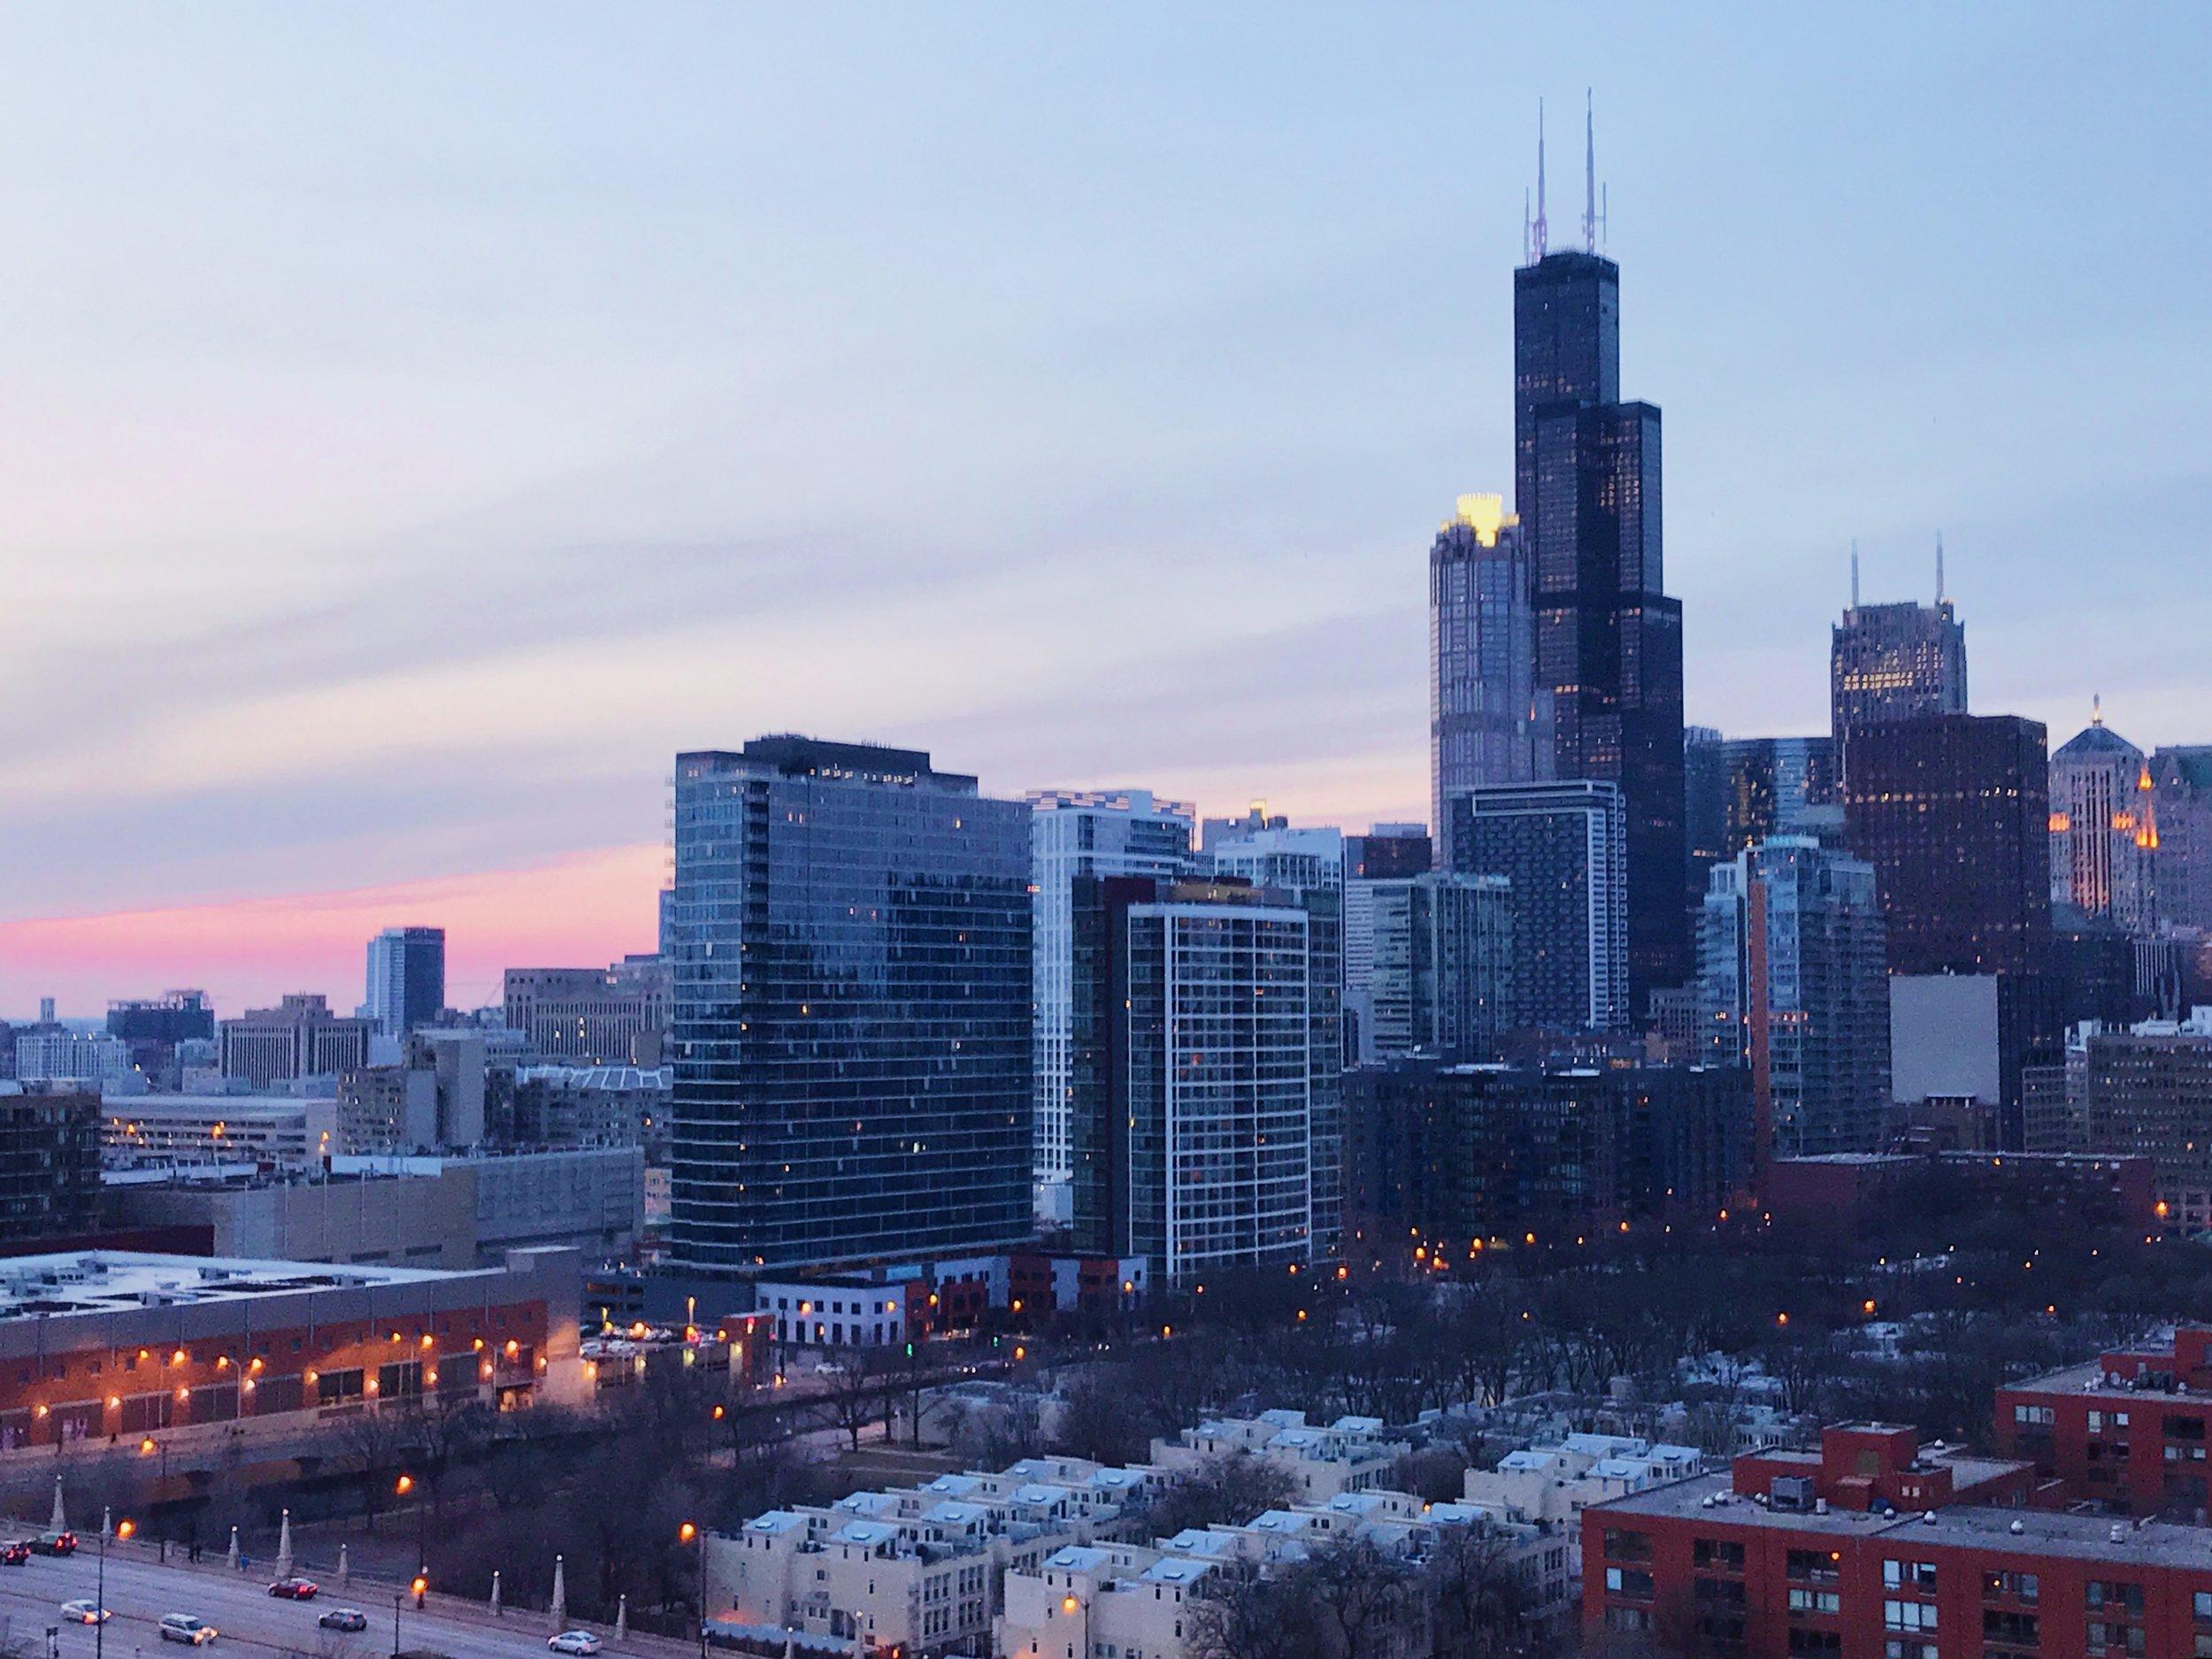 1255-s-state-1814-kourtney-murray-chicago-real-estate-south-loop-skyline-sunset.jpg